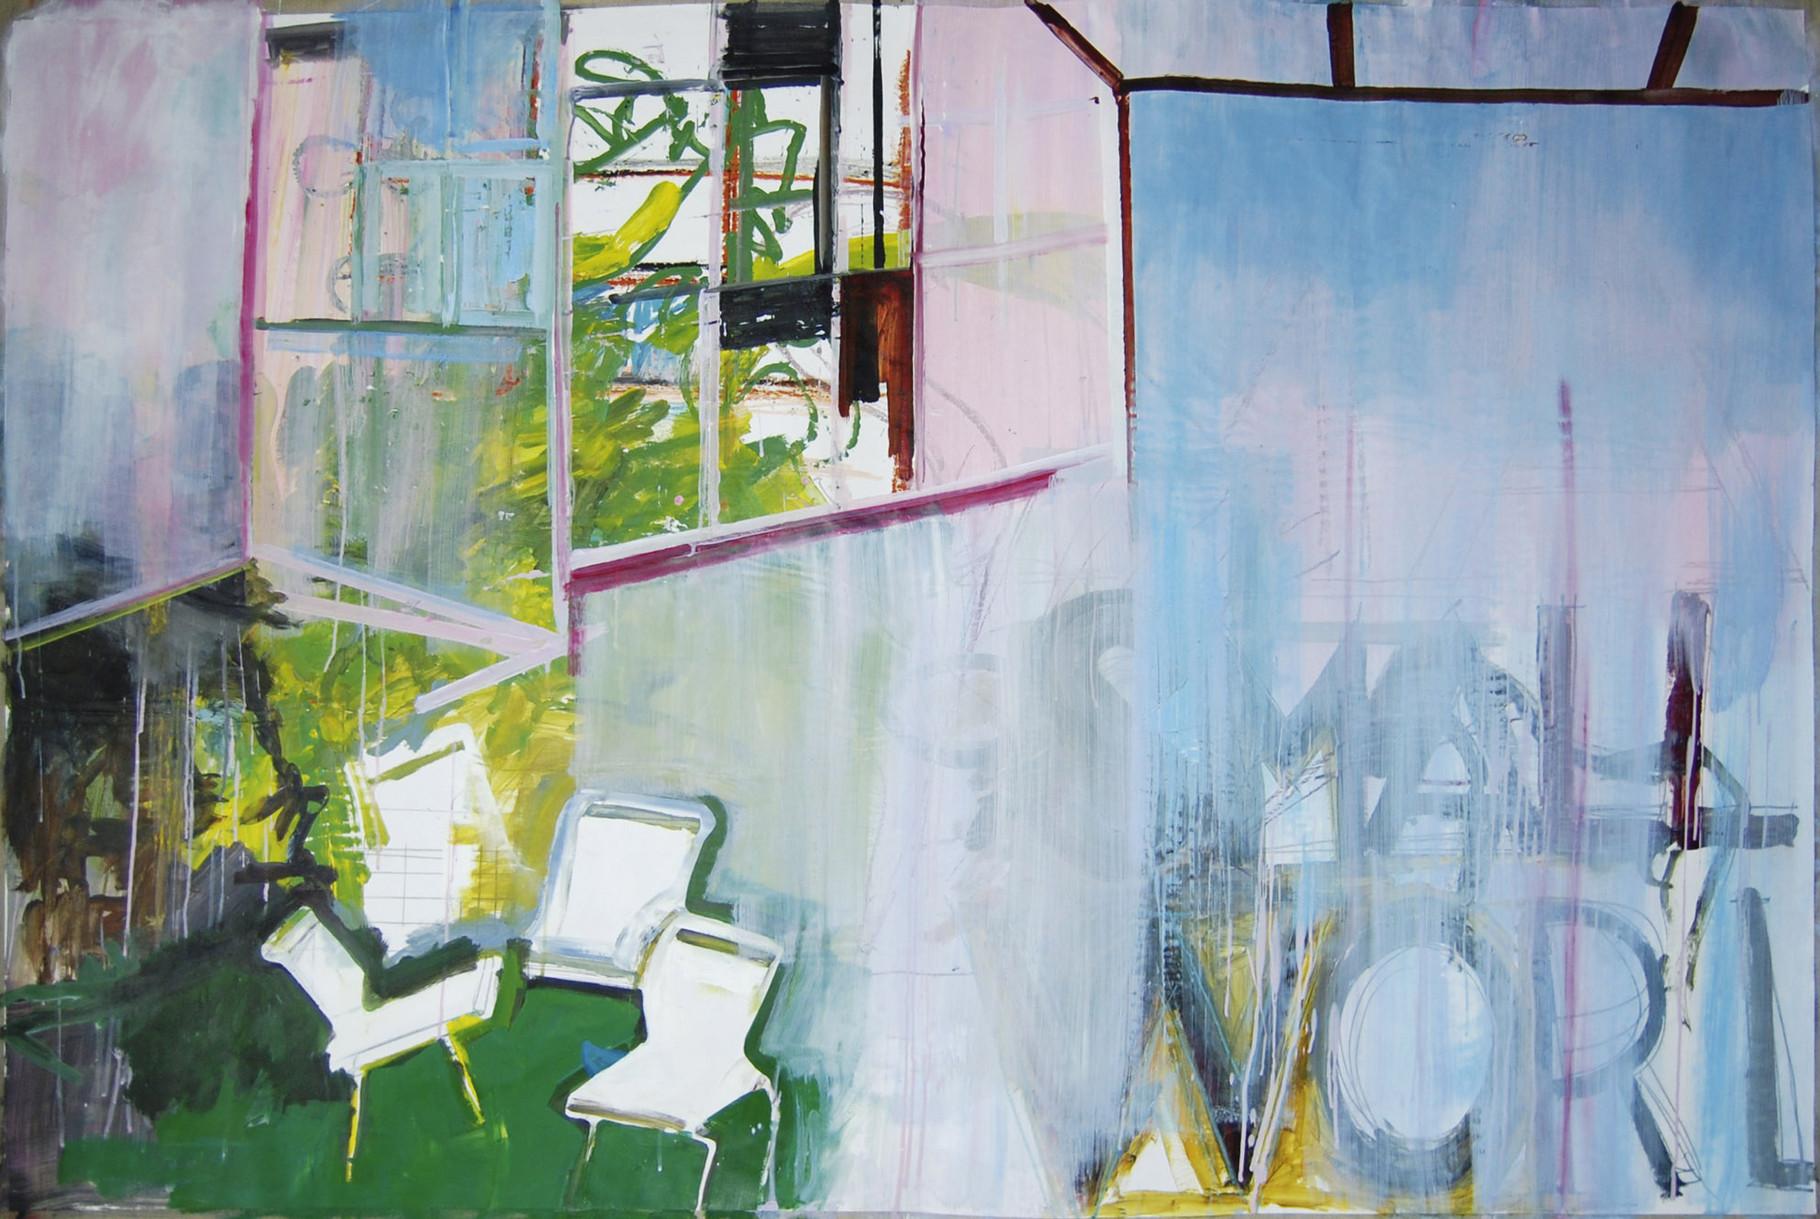 GARDEN SITTING  I  acryl, graphit, kreide u. m. auf hahnemühle karton  I  200 x 132 cm